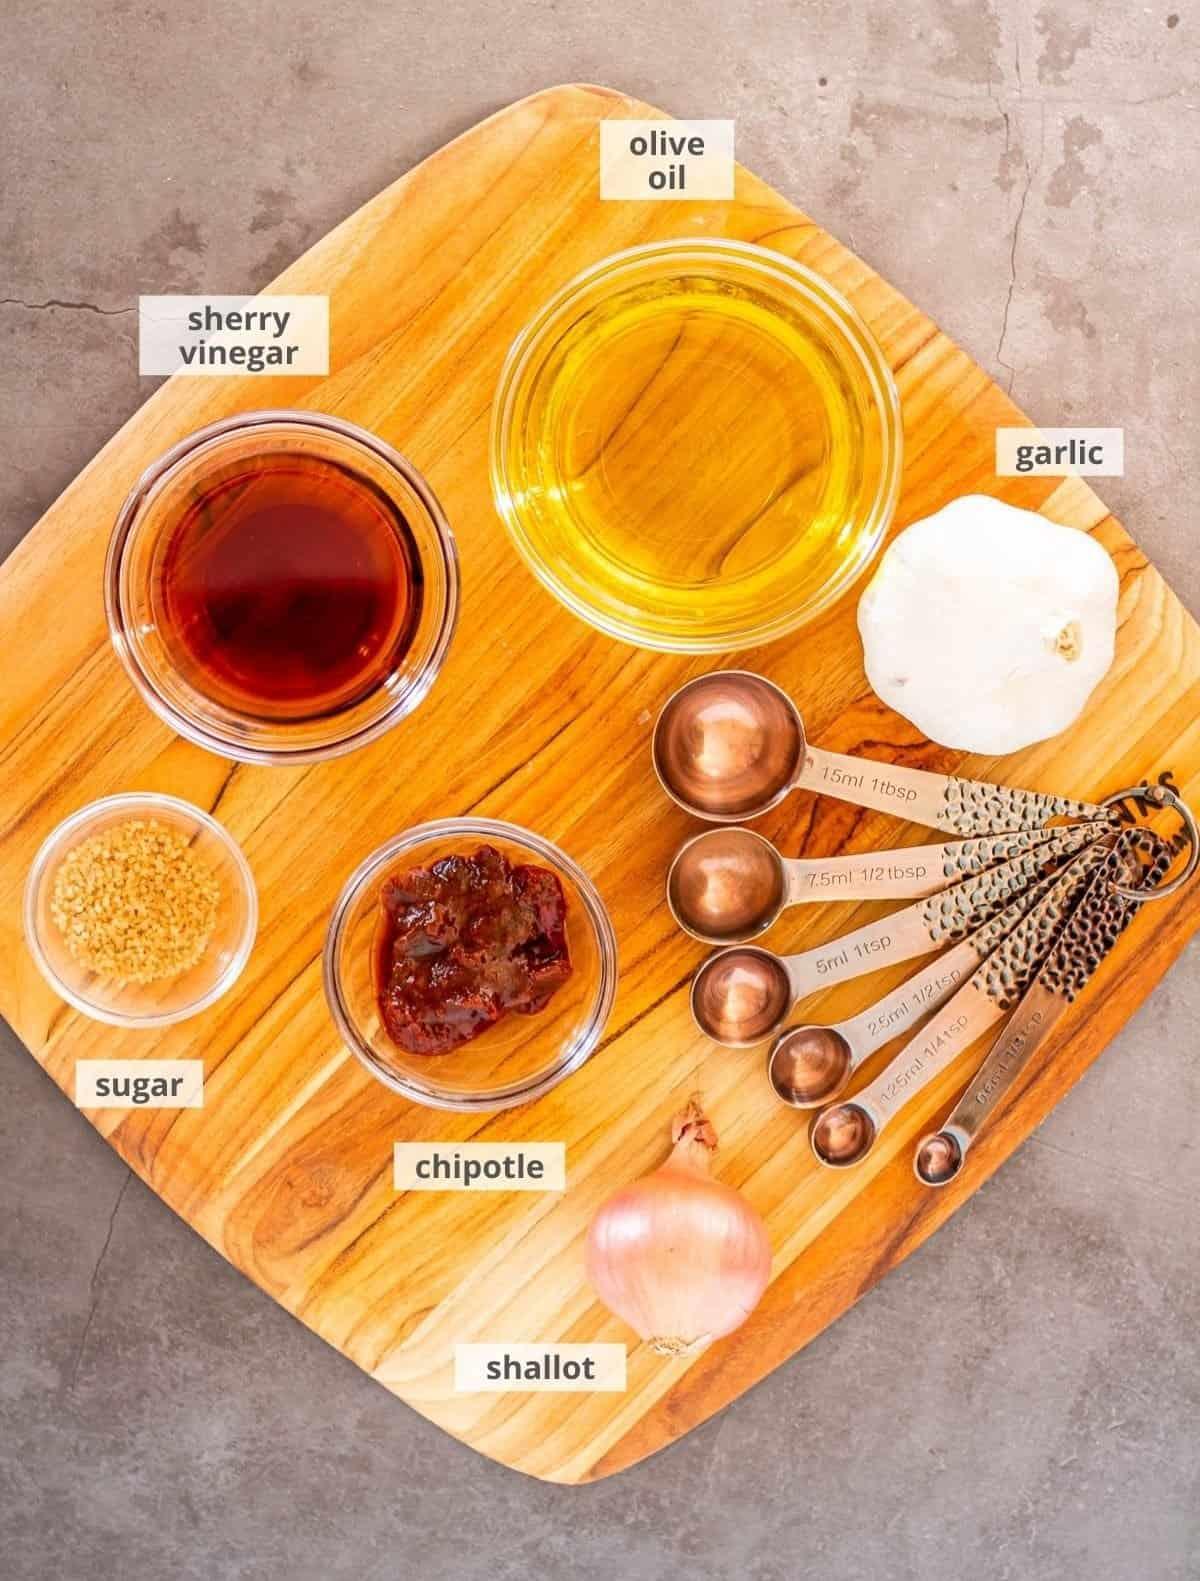 The ingredients for the chipotle vinaigrette: olive oil, garlic, shallot, chipotle, sugar, sherry vinegar.